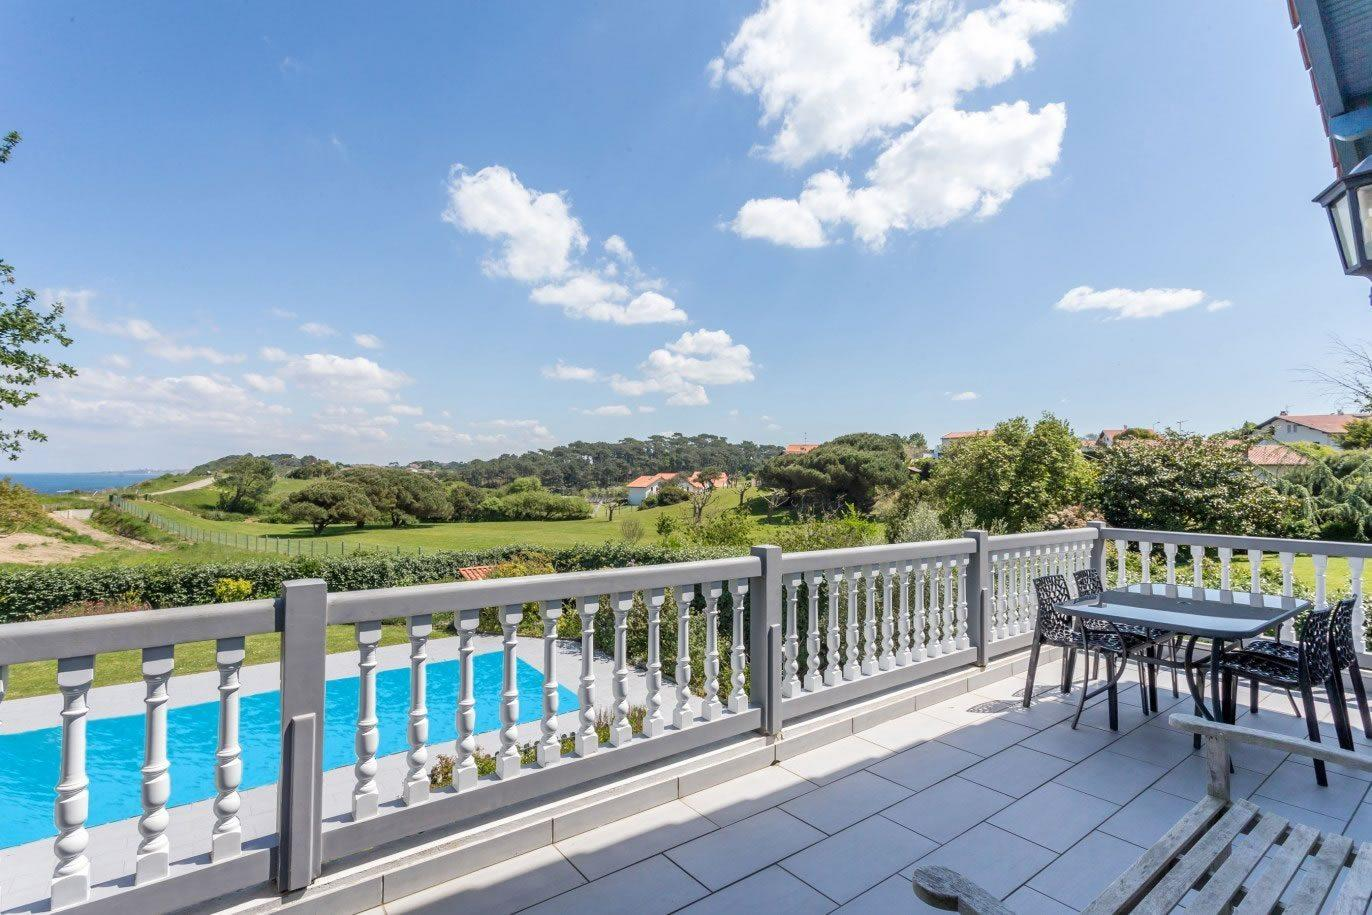 Villa 200 m tres de la plage avec piscine vendre for Piscine zodiac occasion le bon coin